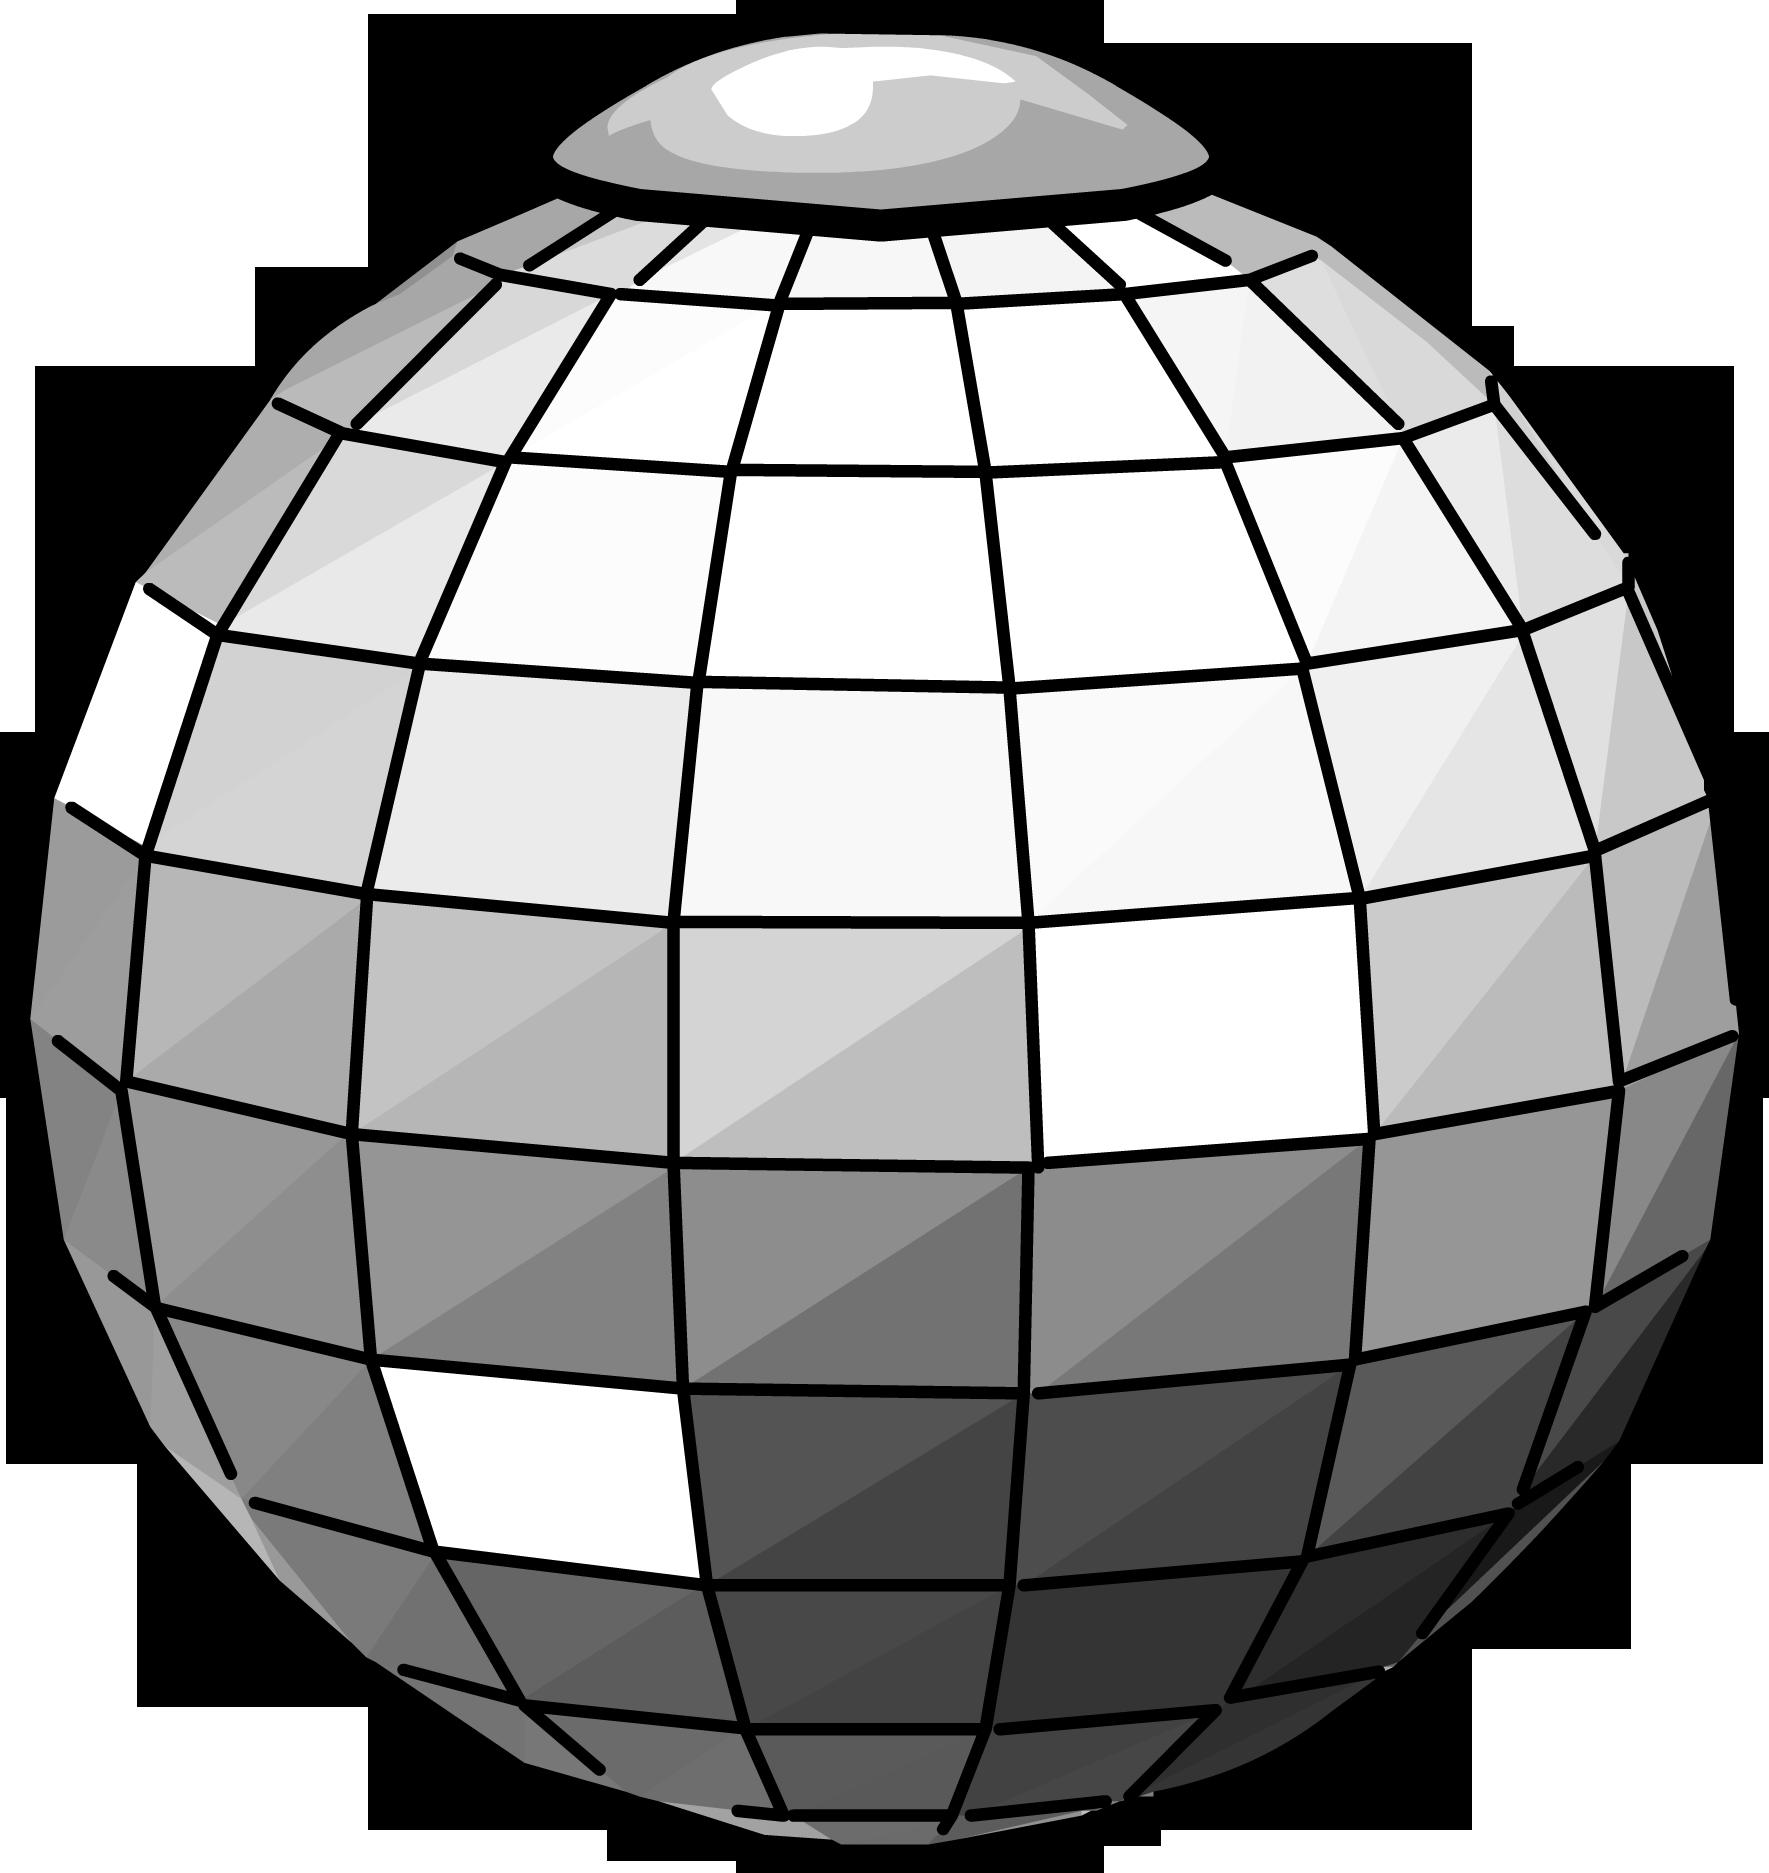 1769x1873 Image